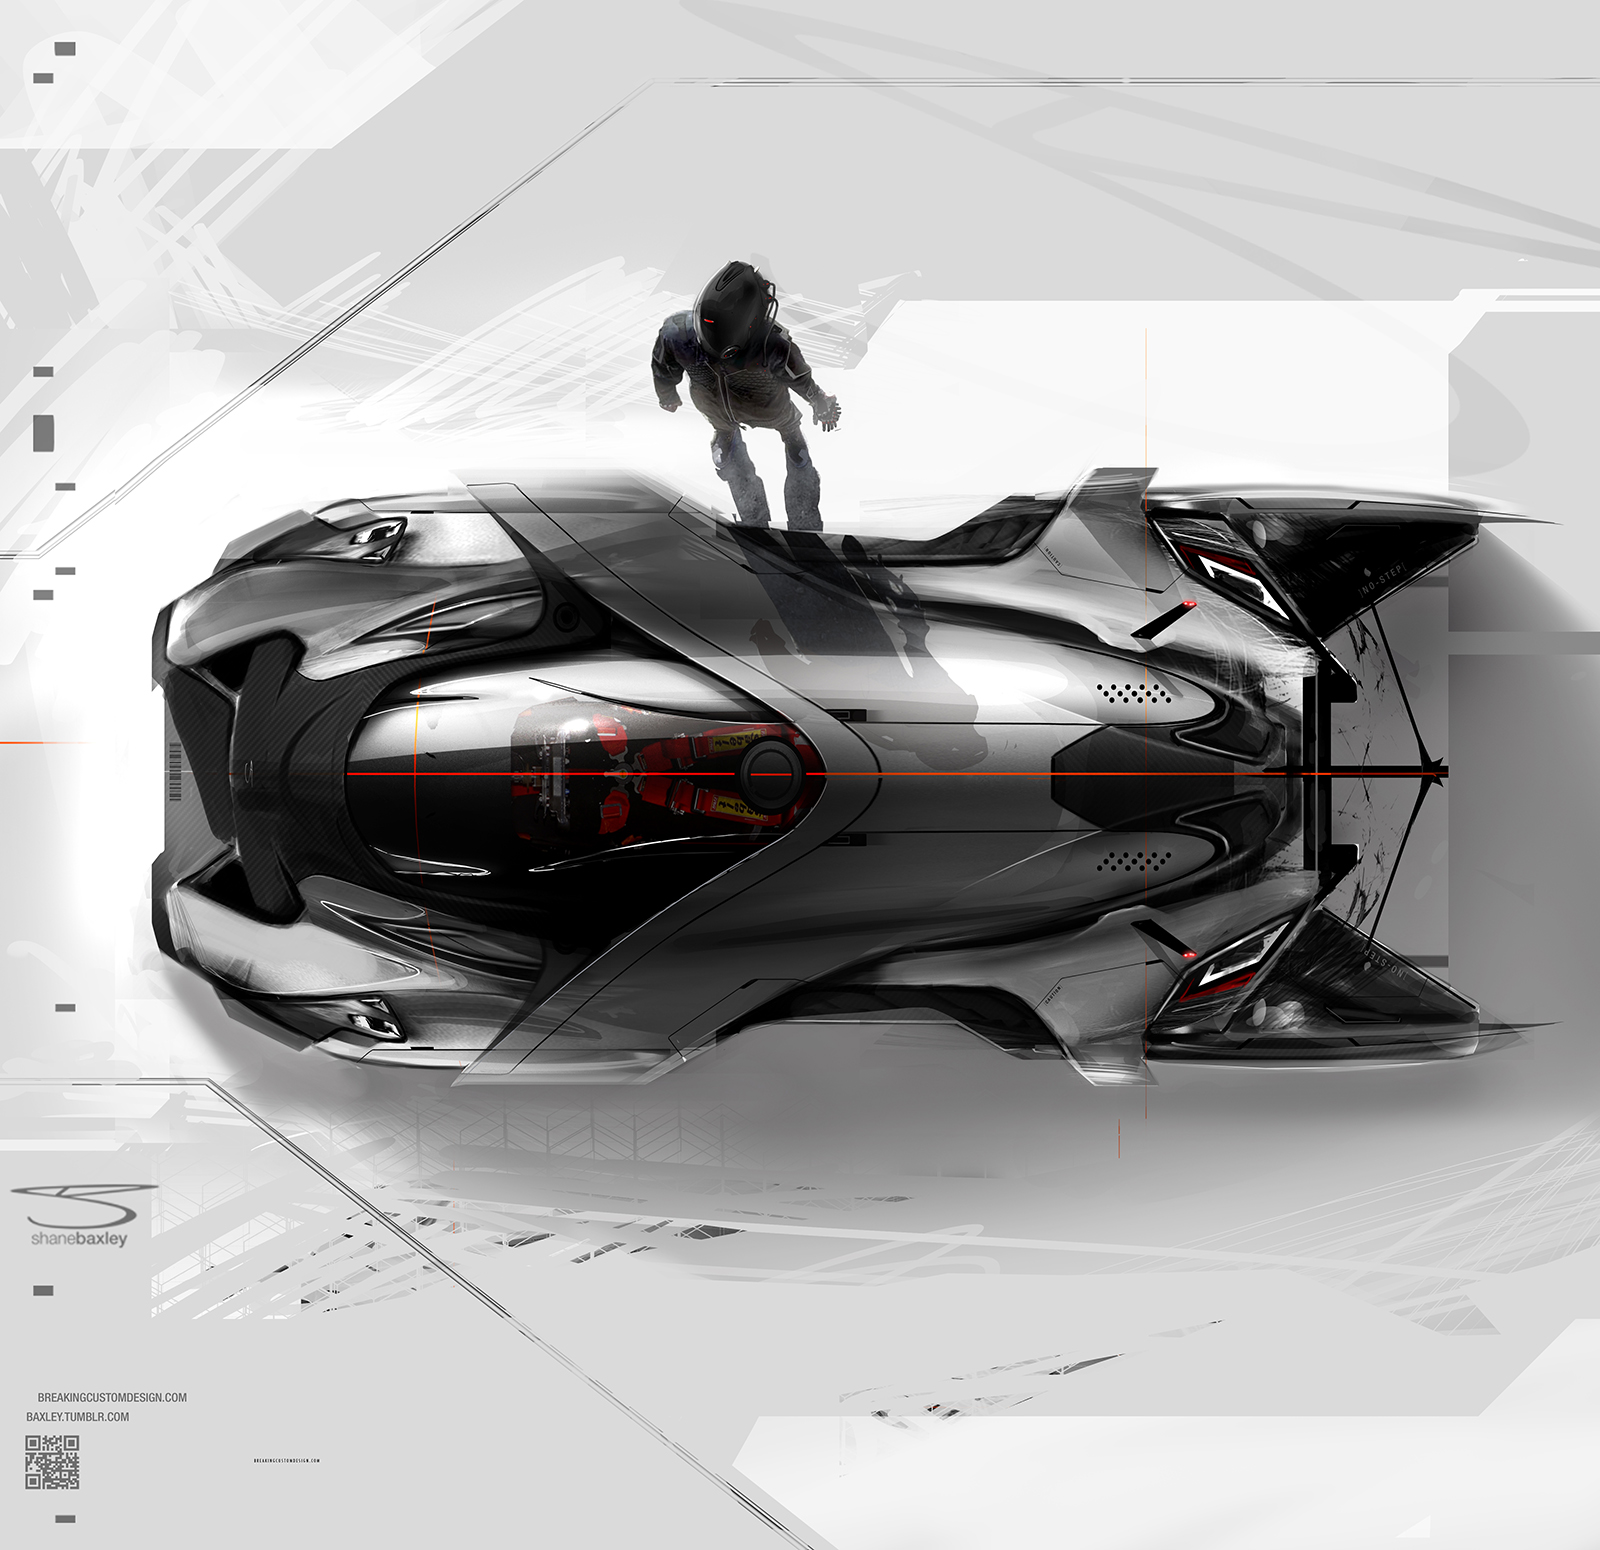 baxley_racer-lO.jpg